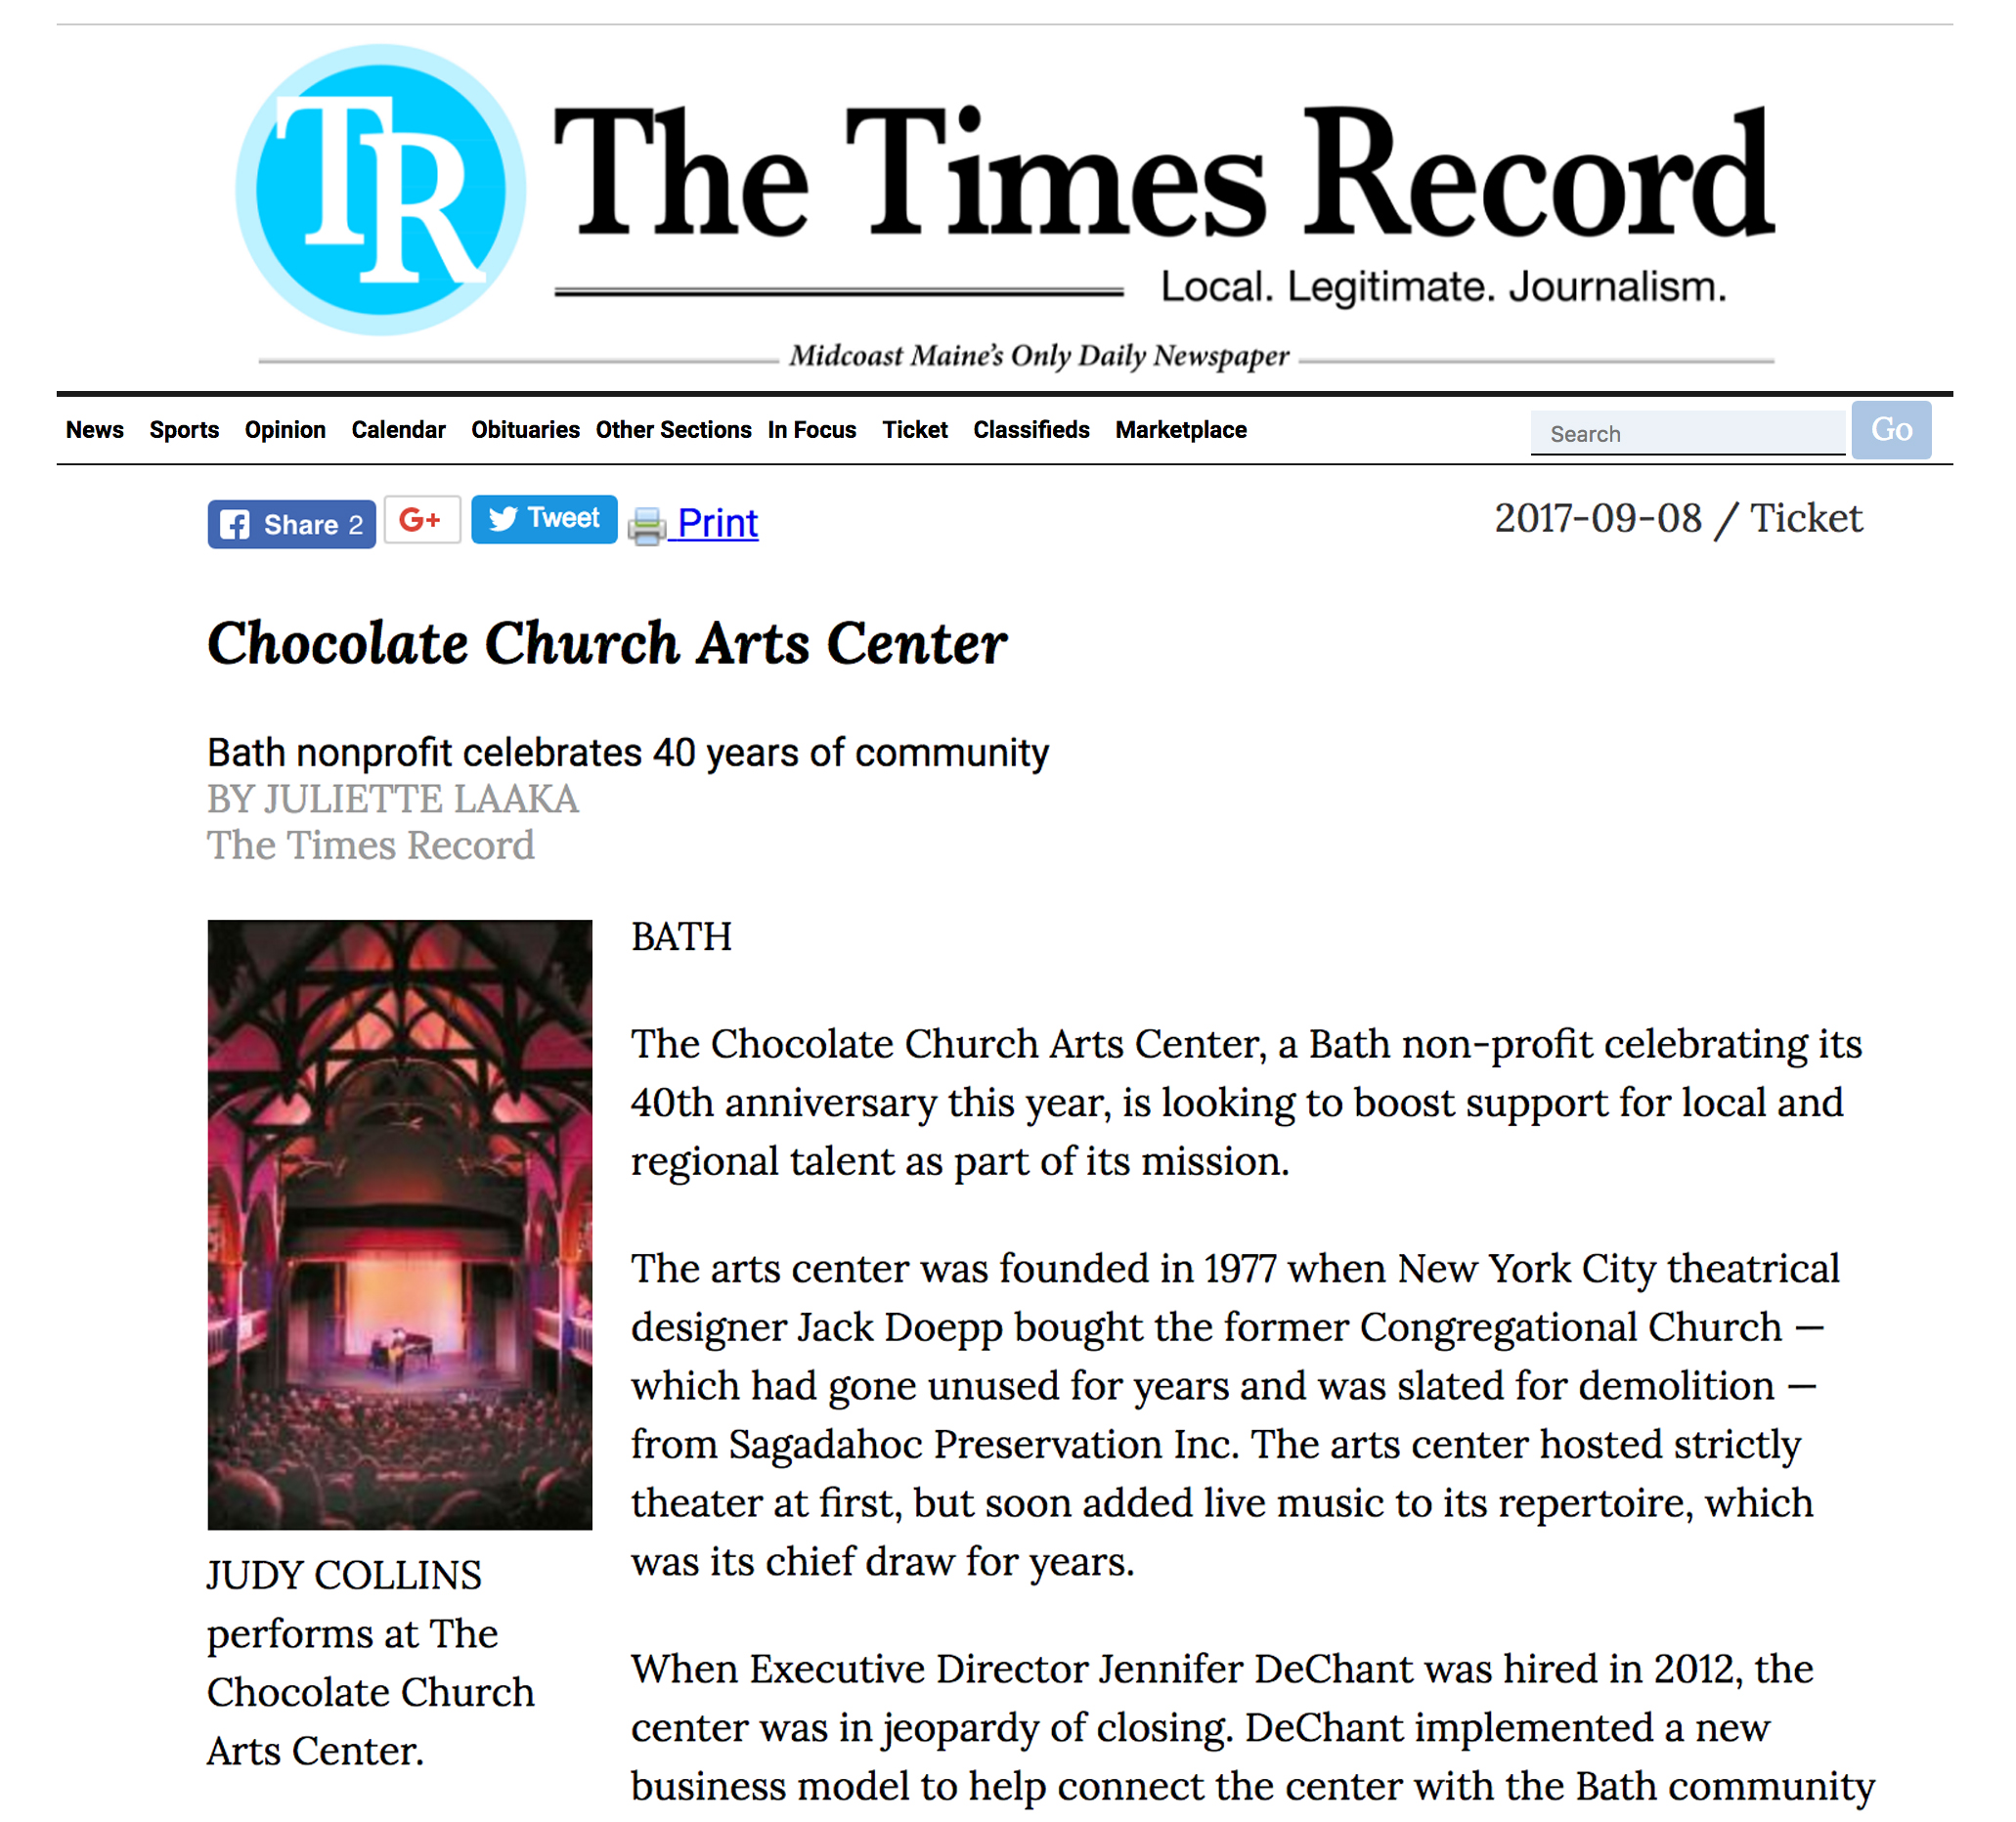 Bath Nonprofit Celebrates 40 Years Of Community U2014 The Chocolate Church Arts  Center